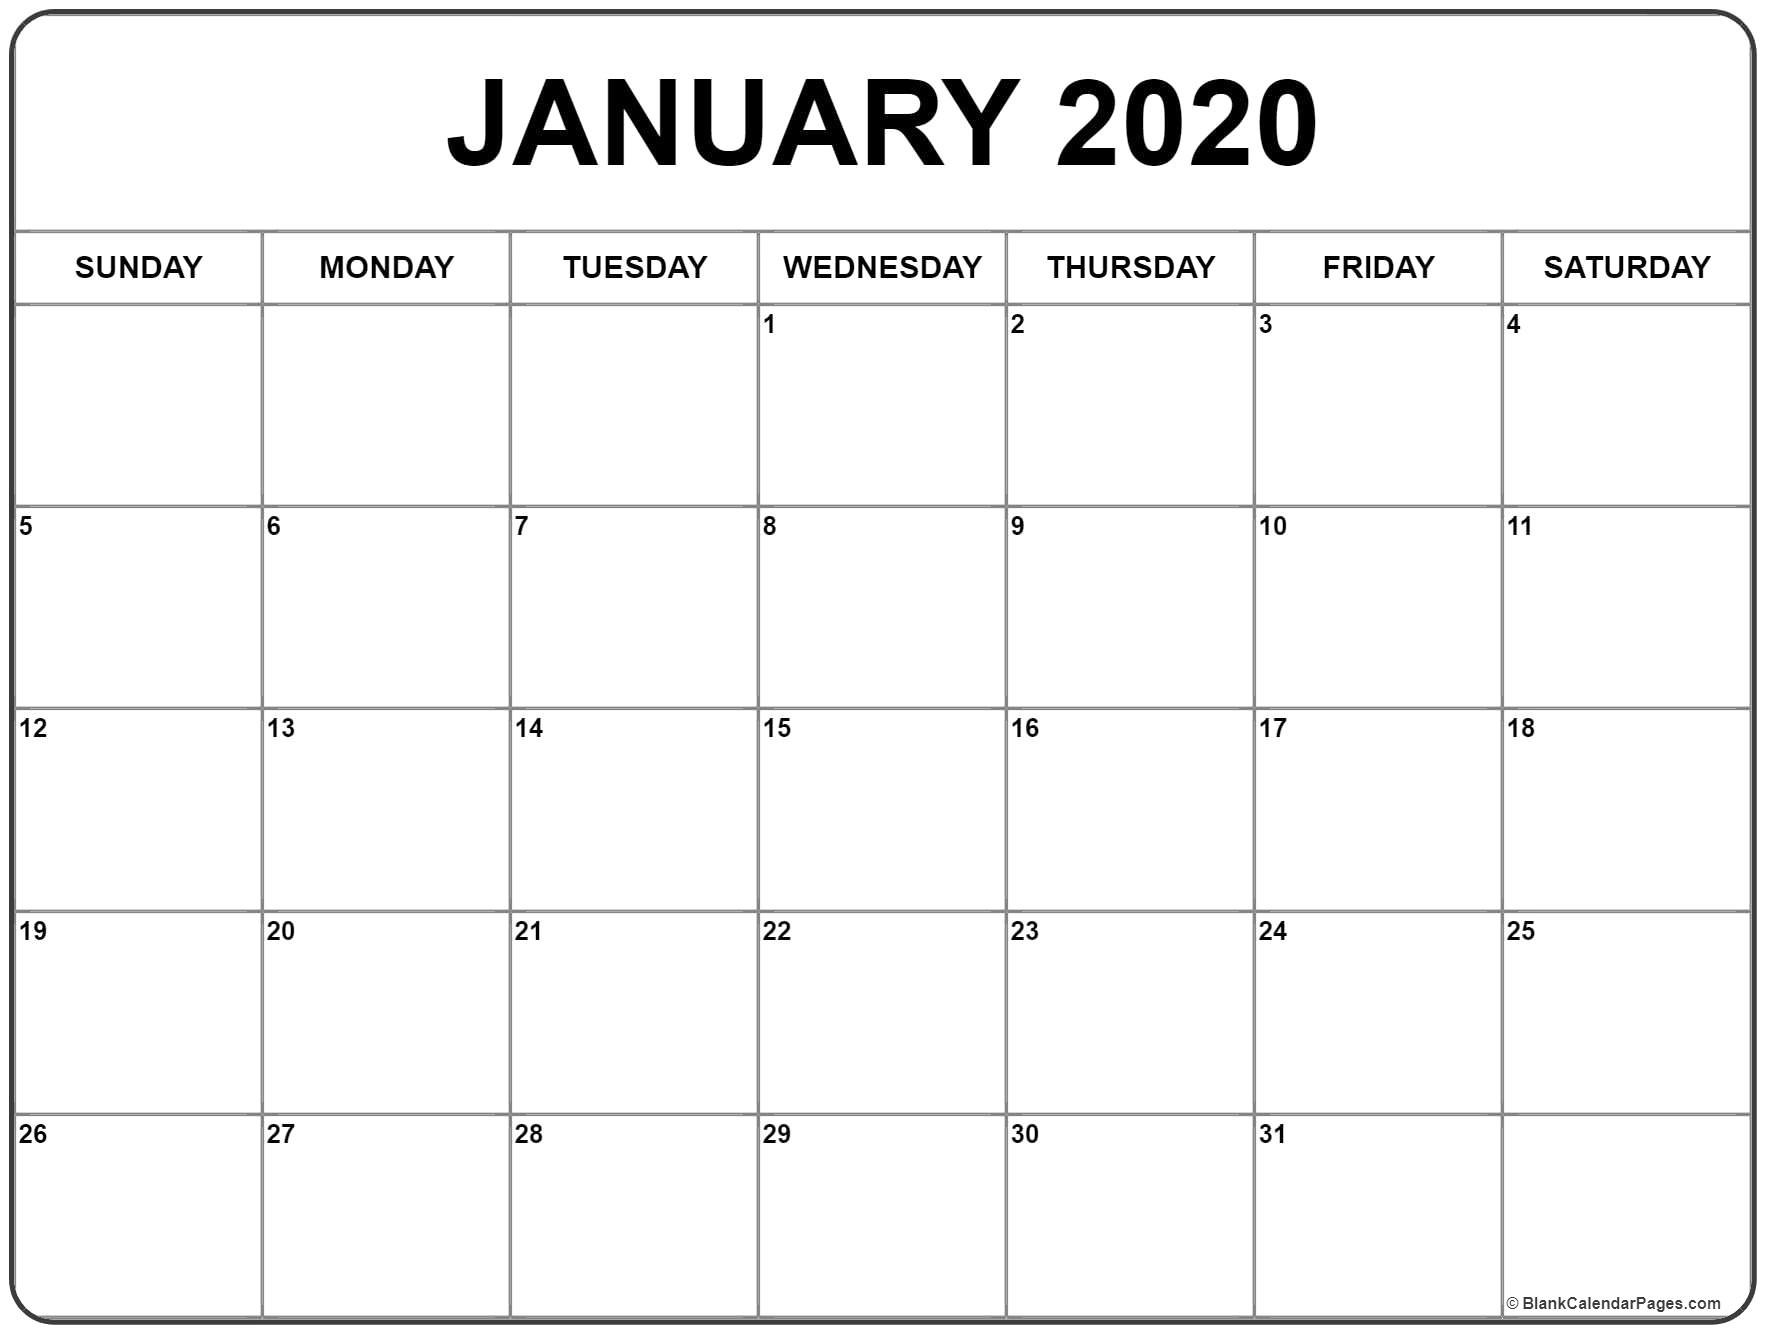 January 2020 Calendar B2 | Jcreview-January 2020 Calendar With Moon Phases